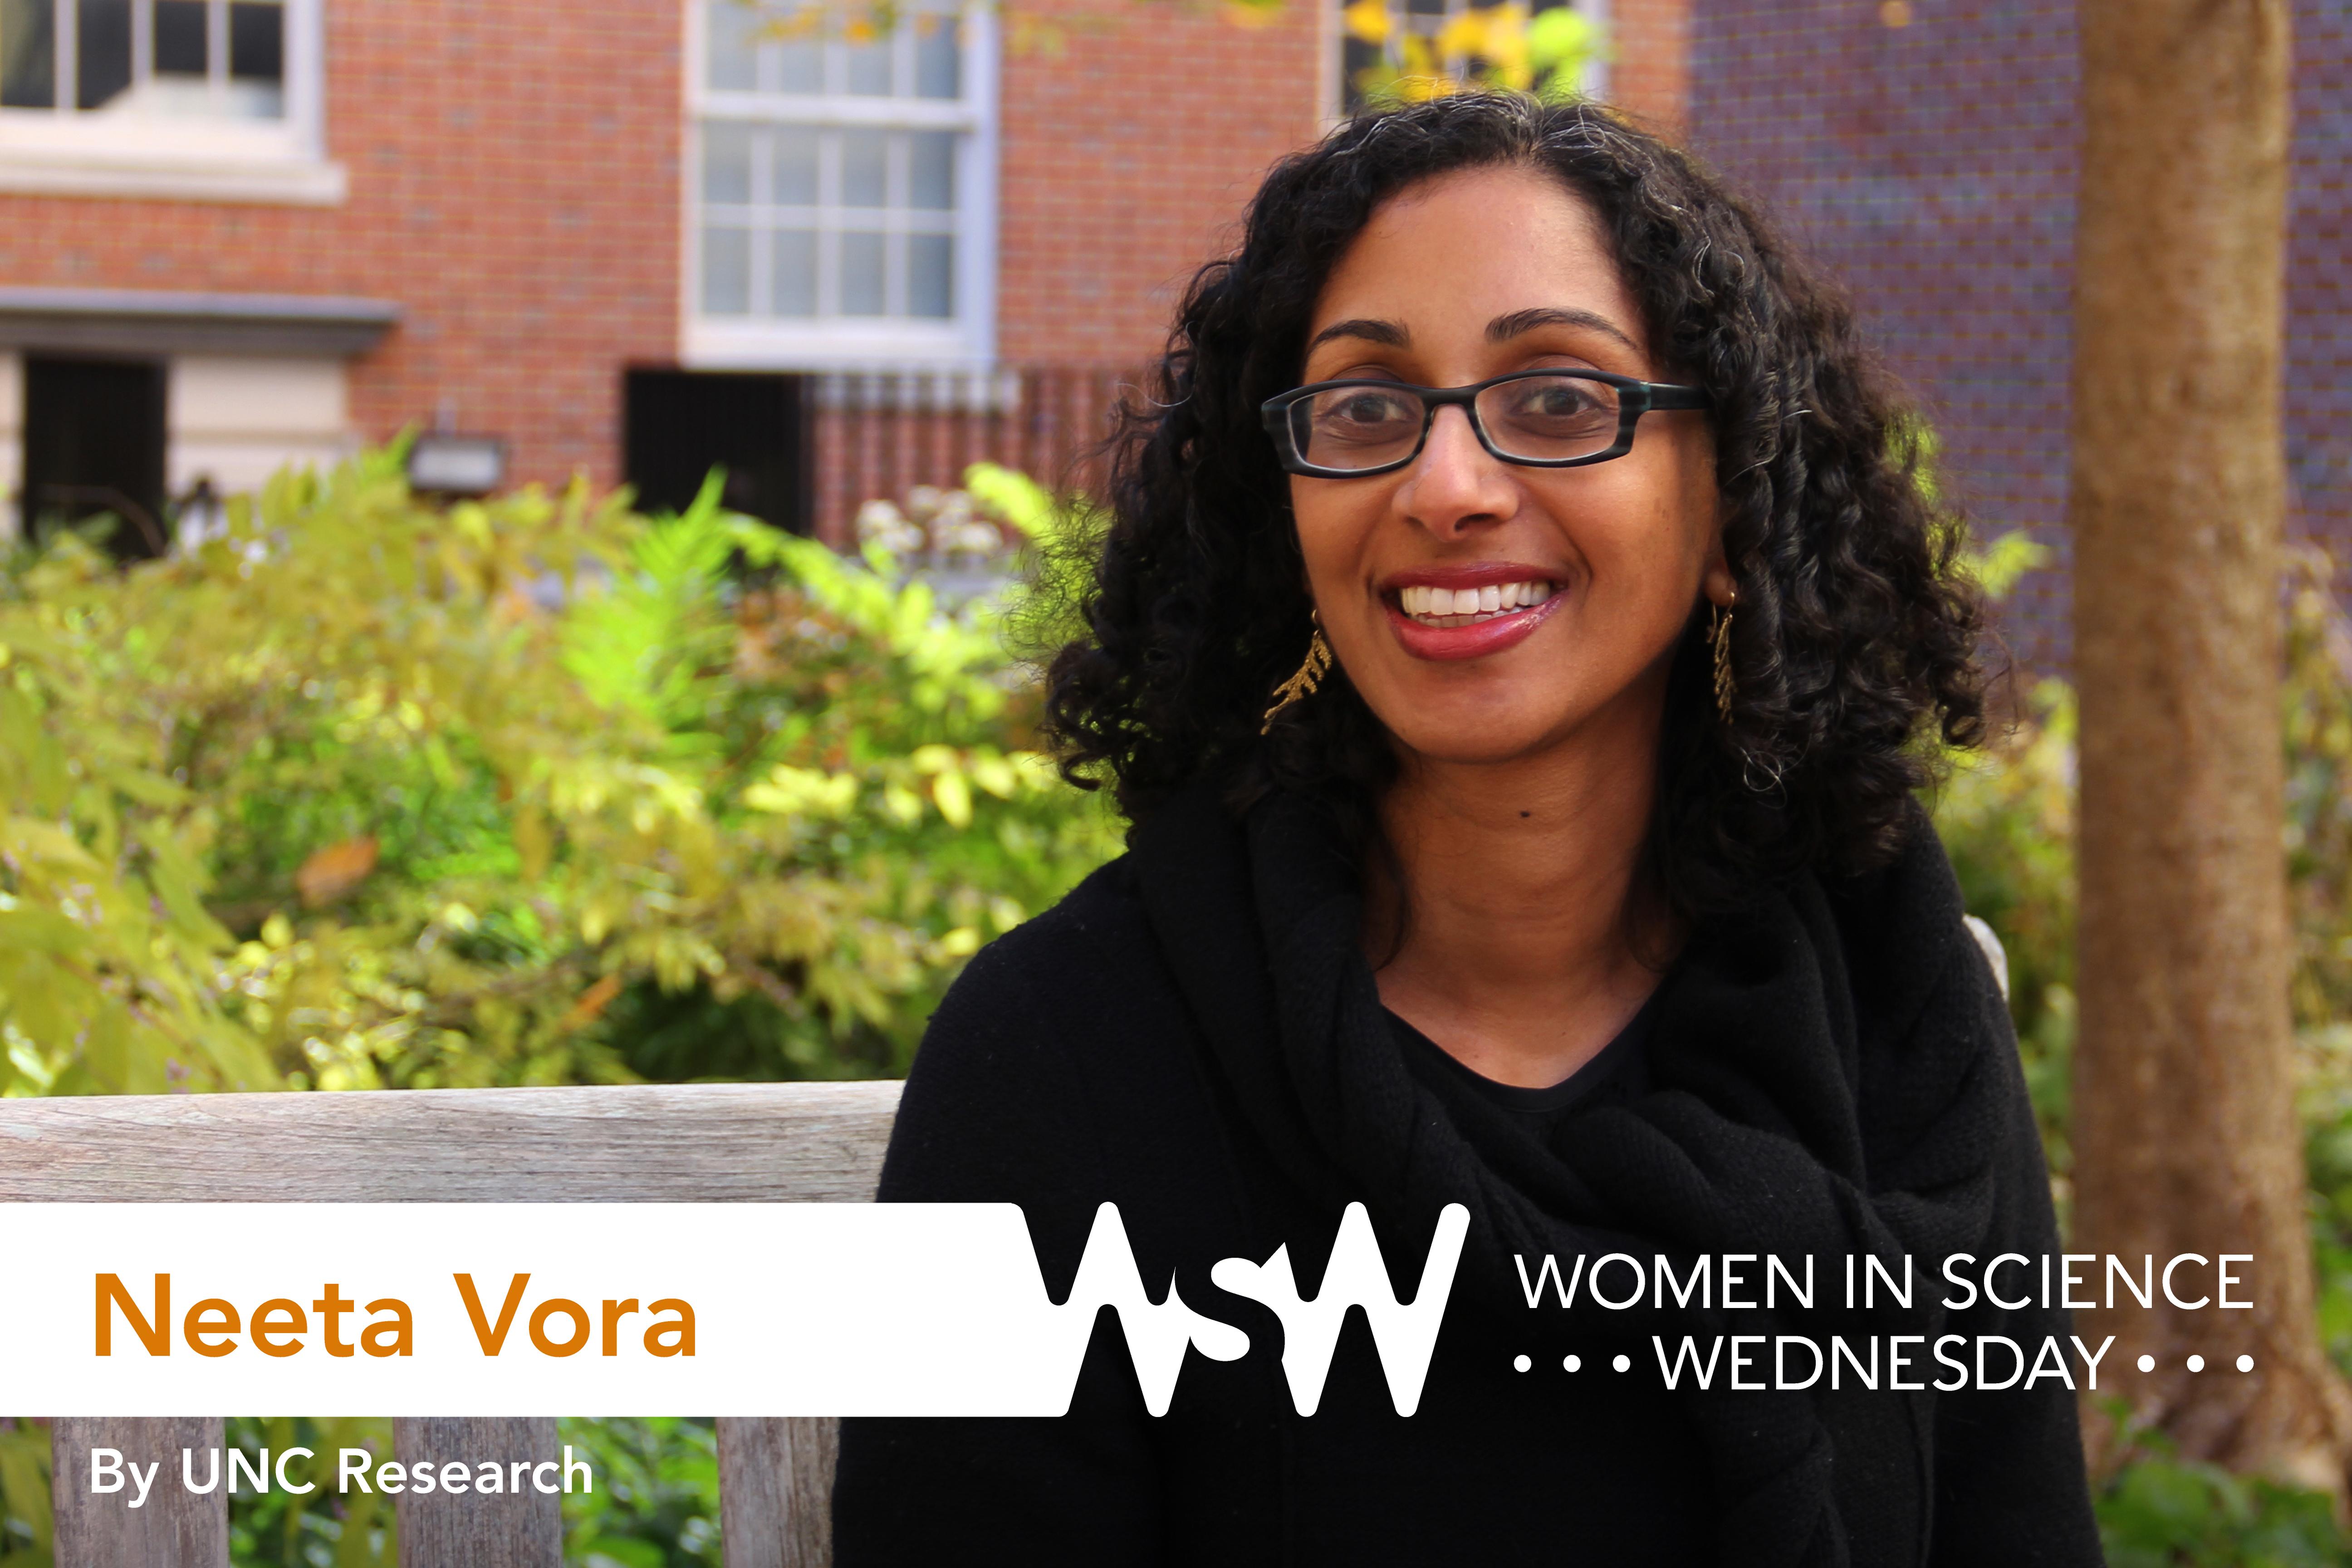 Portrait of Neeta Vora on campus